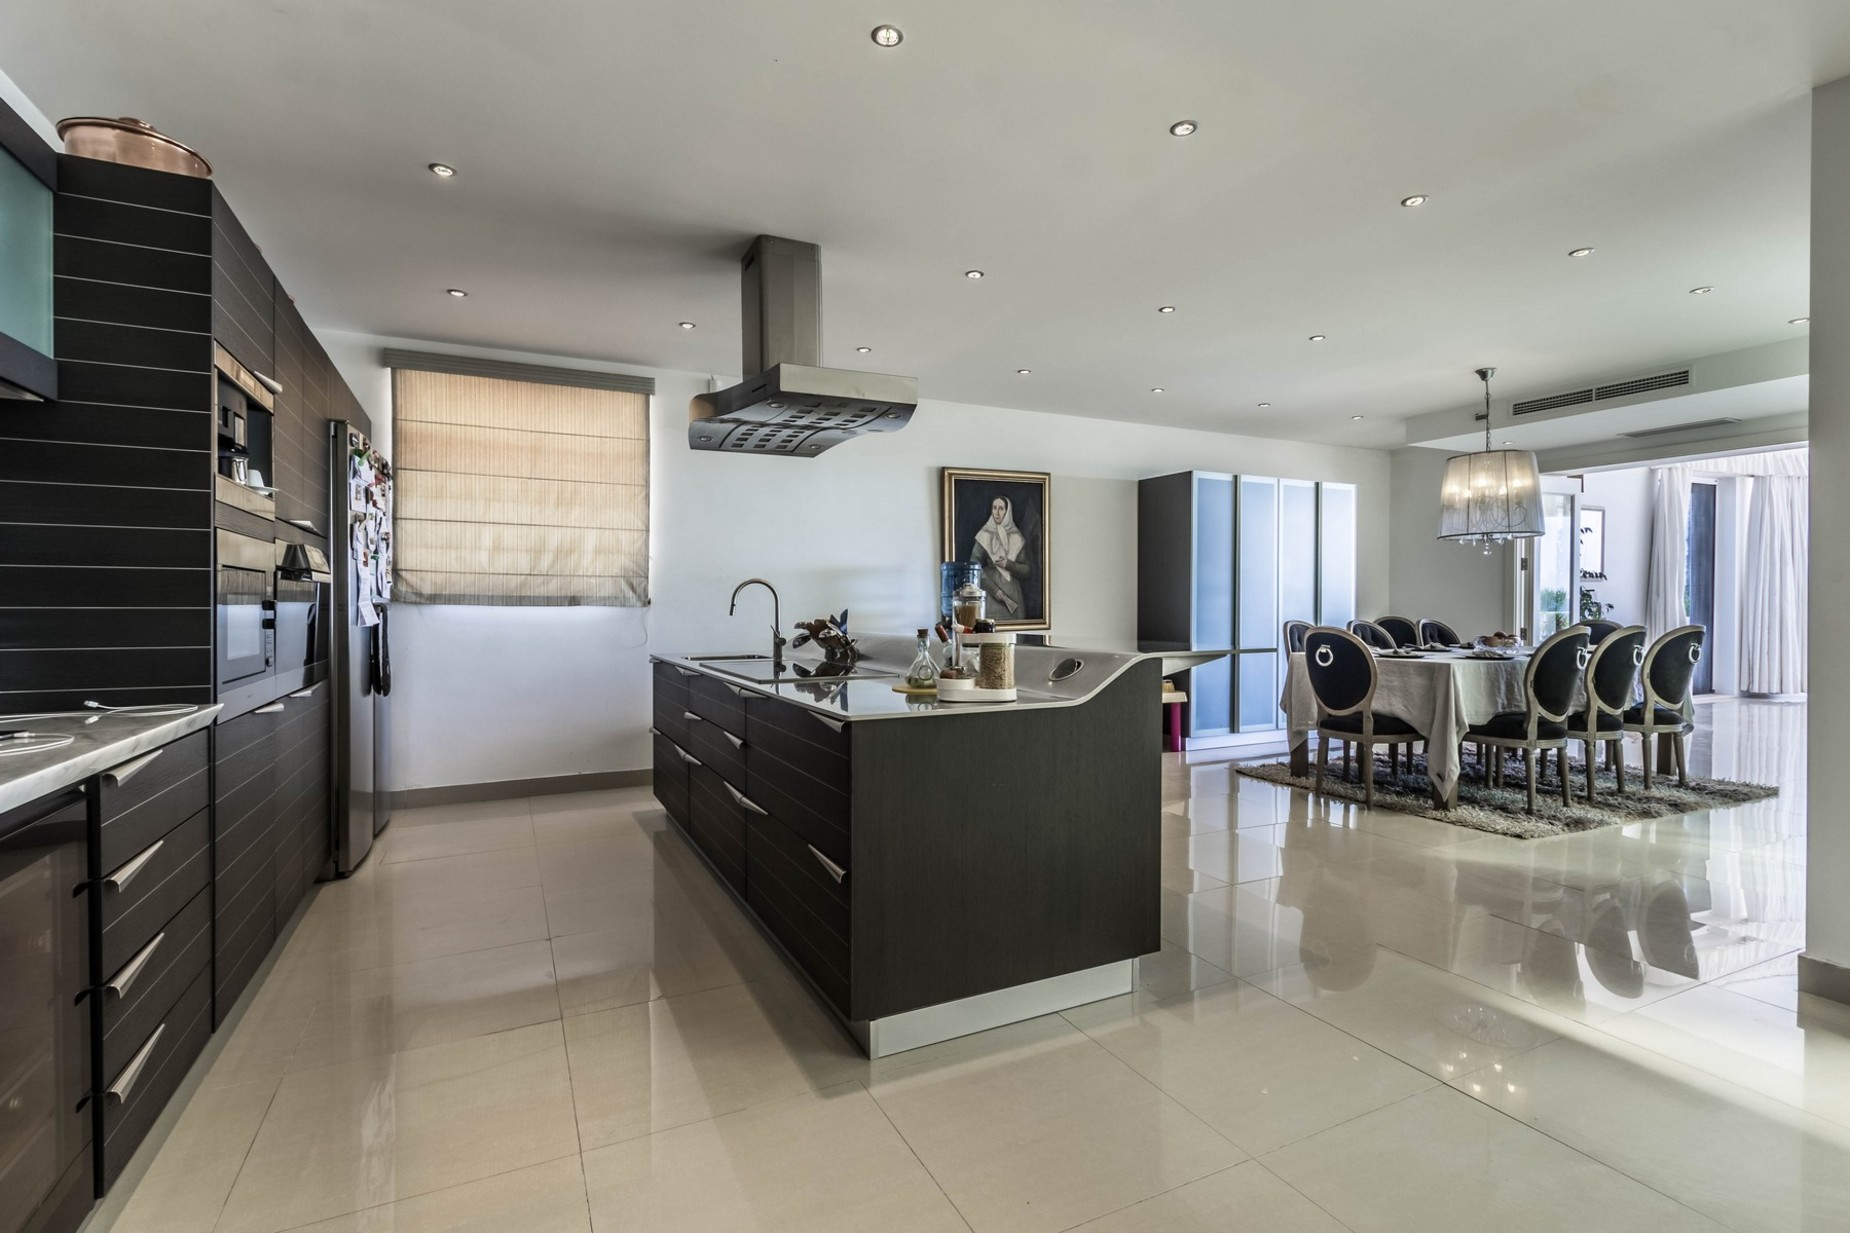 3 bed Villa For Sale in Marsascala, Marsascala - thumb 11